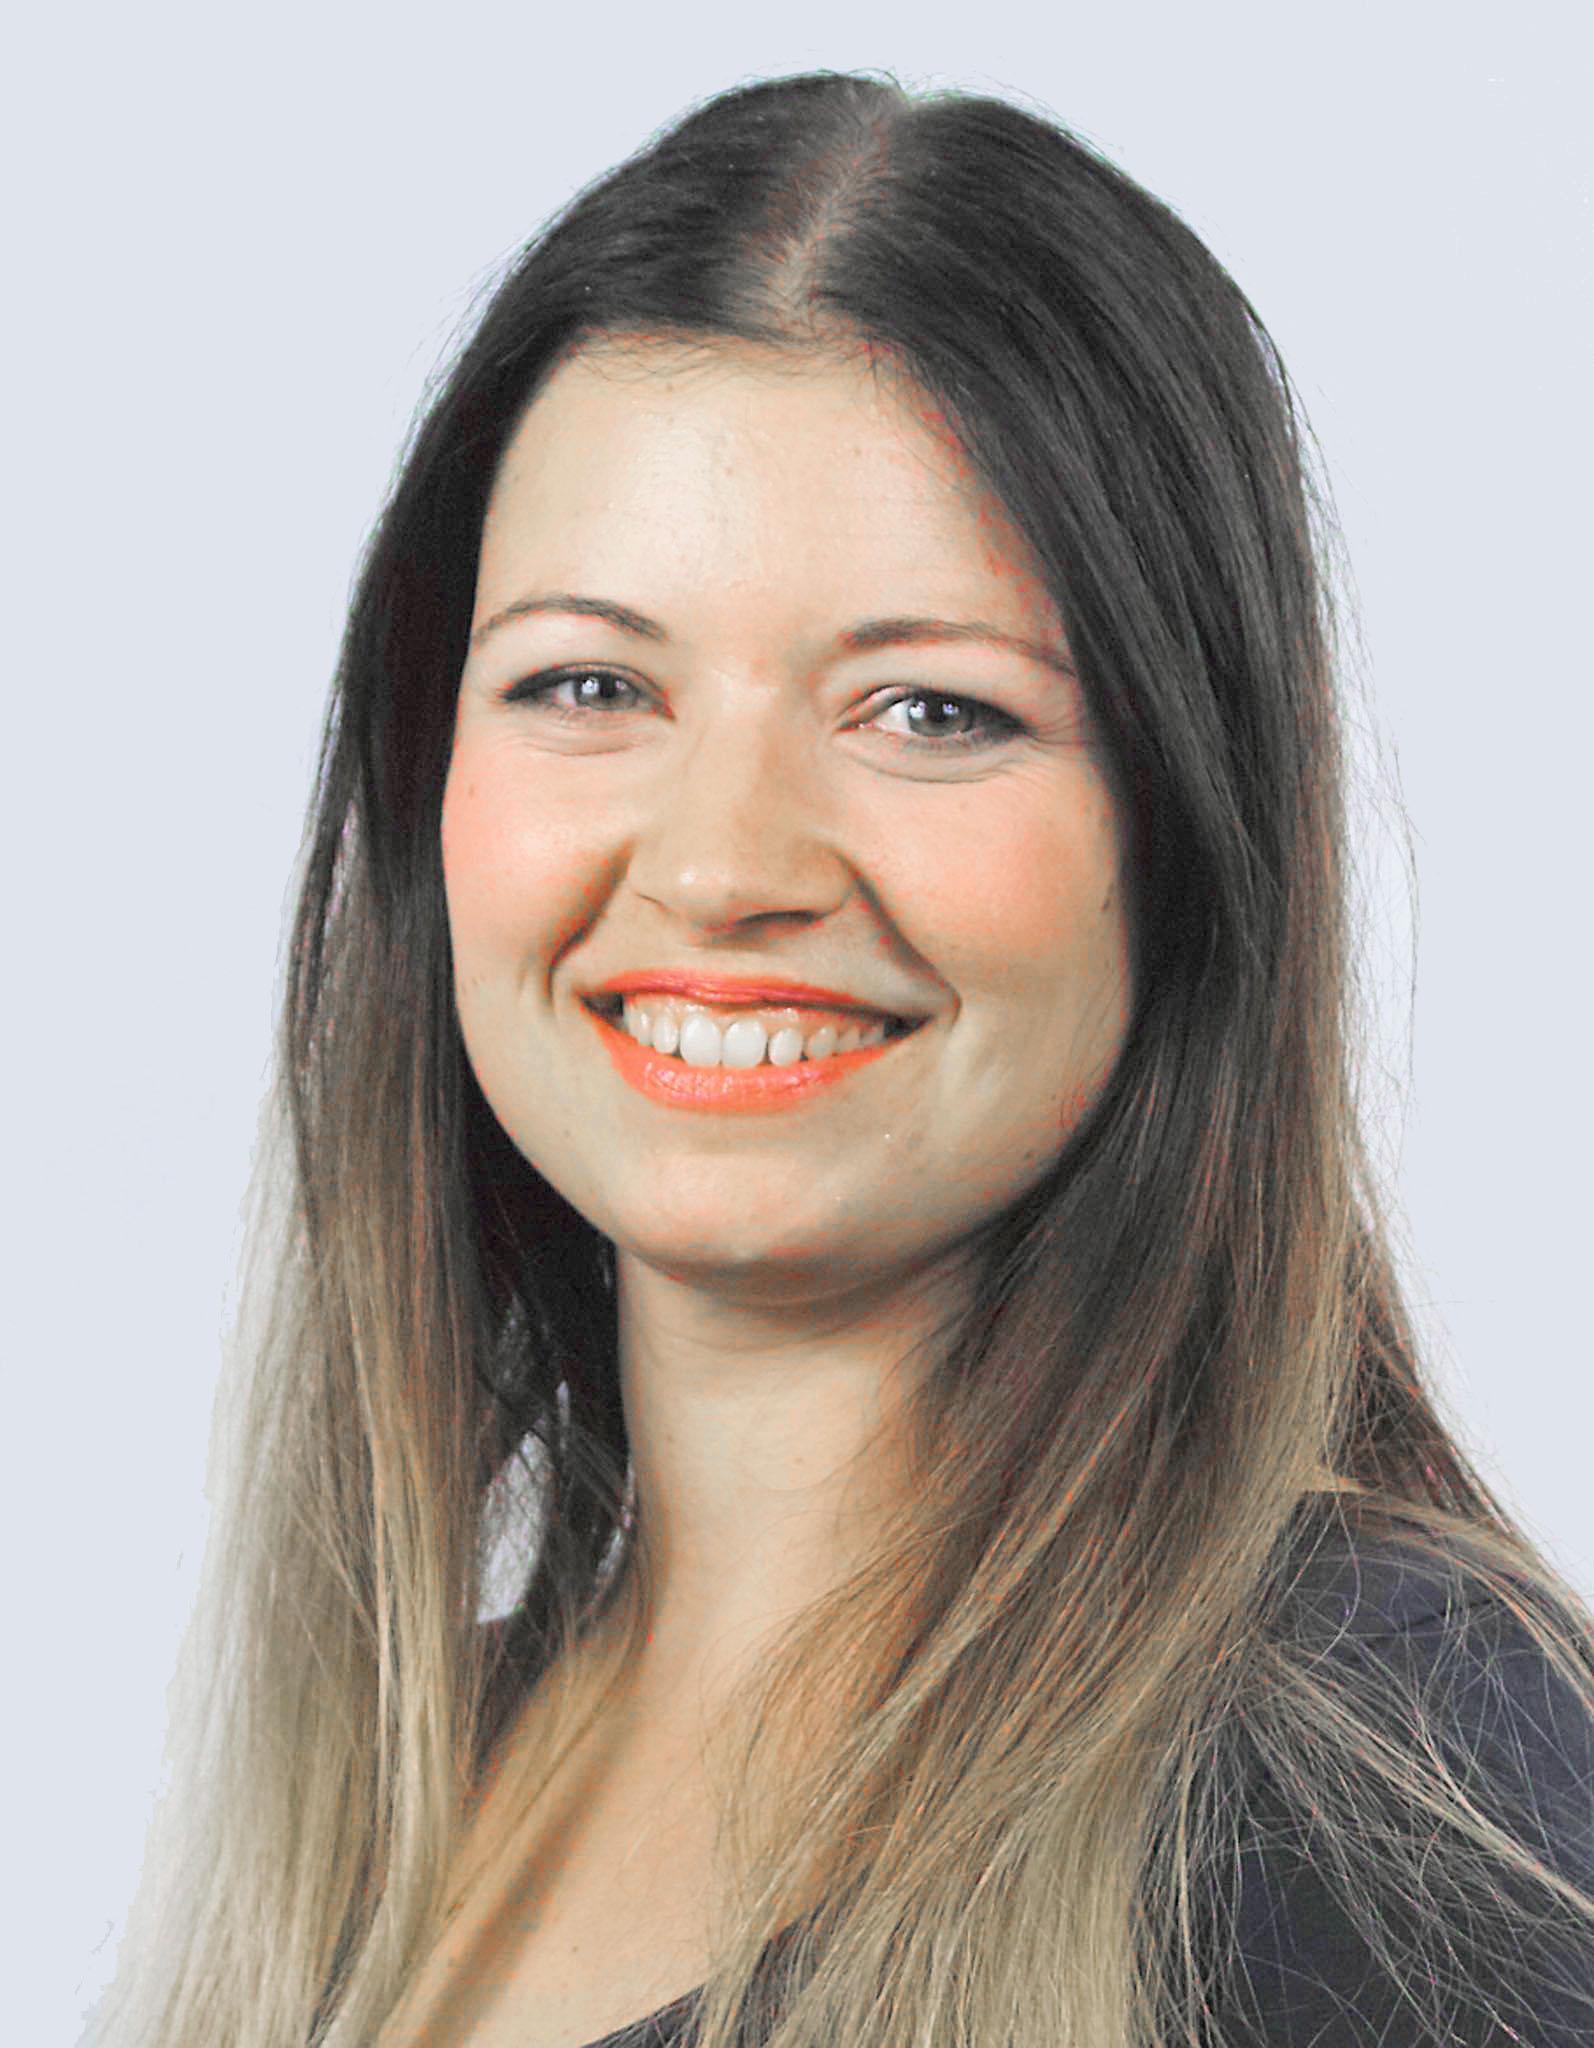 Julia Proyer